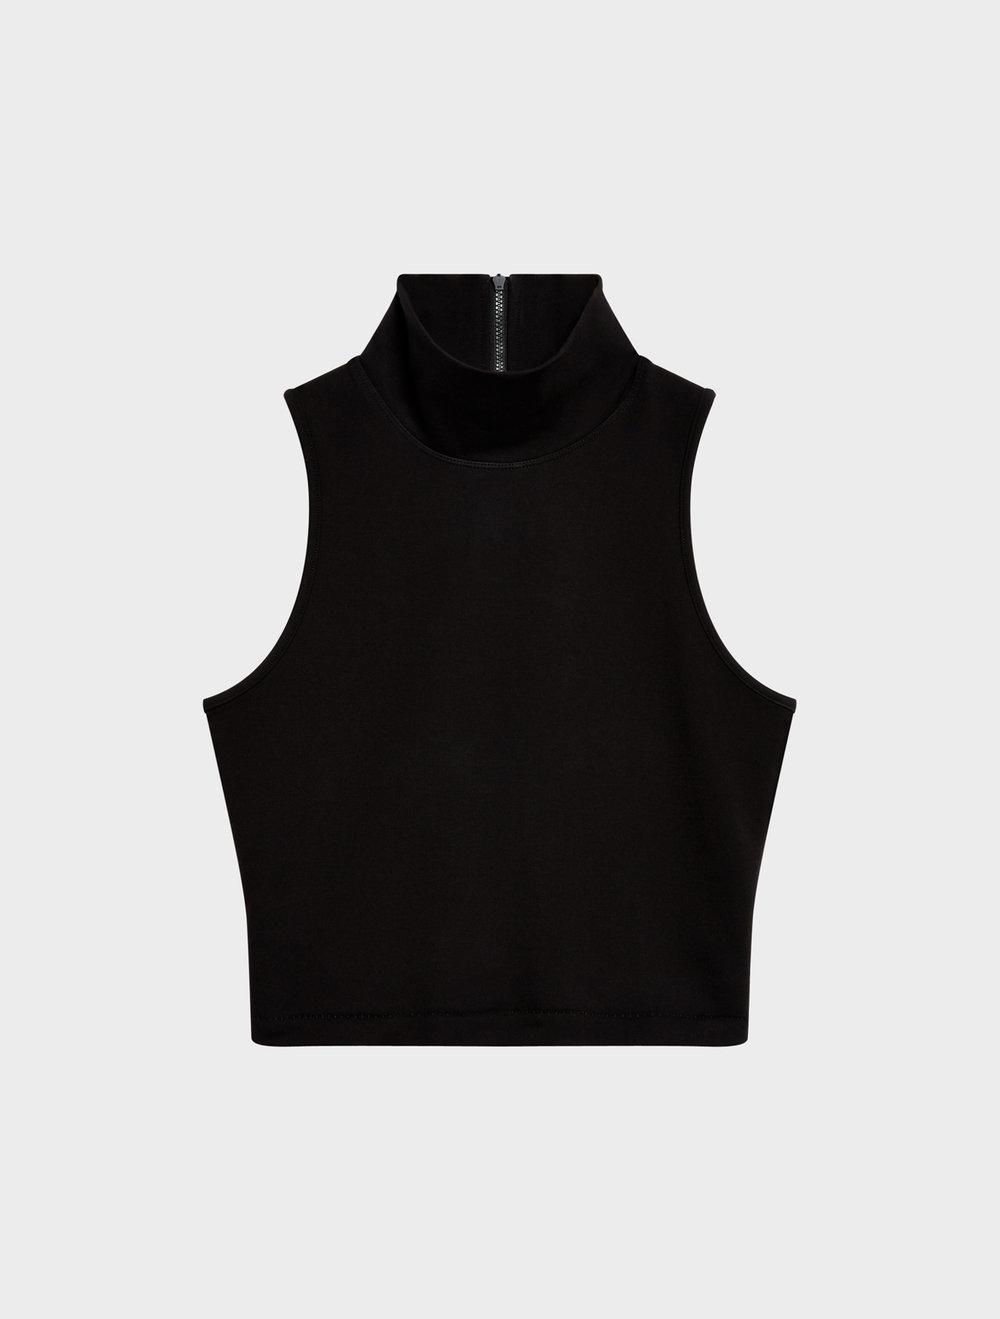 Dkny Sport Mock-Neck Cropped Top In Black